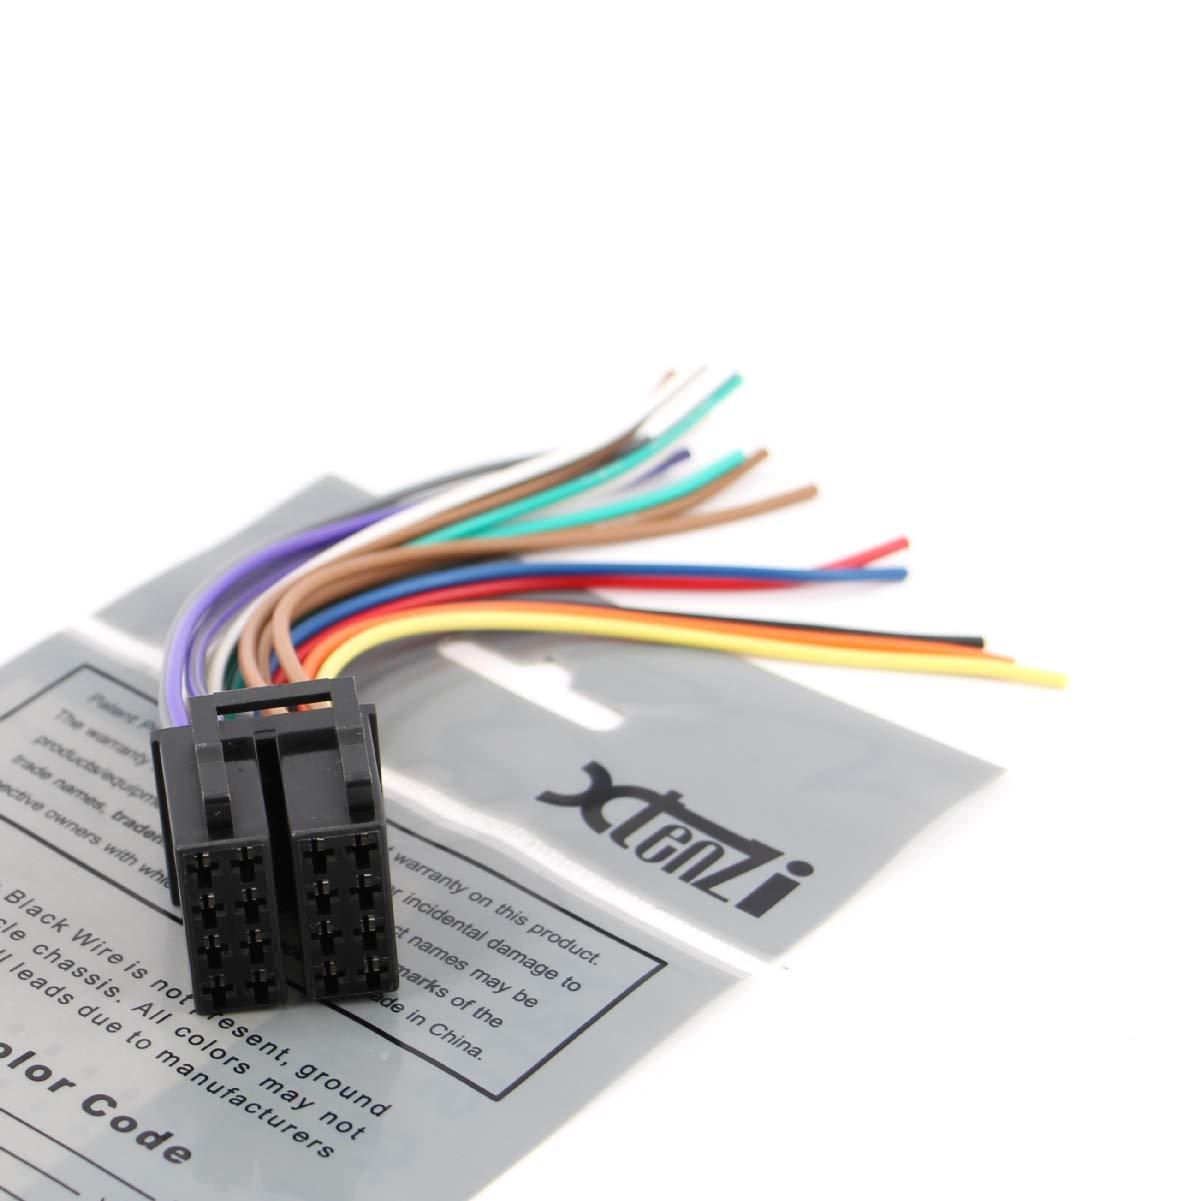 jensen vm9324 wire harness   wiring diagram on jensen sps10 power  supply manual, 20- kenwood 16 pin